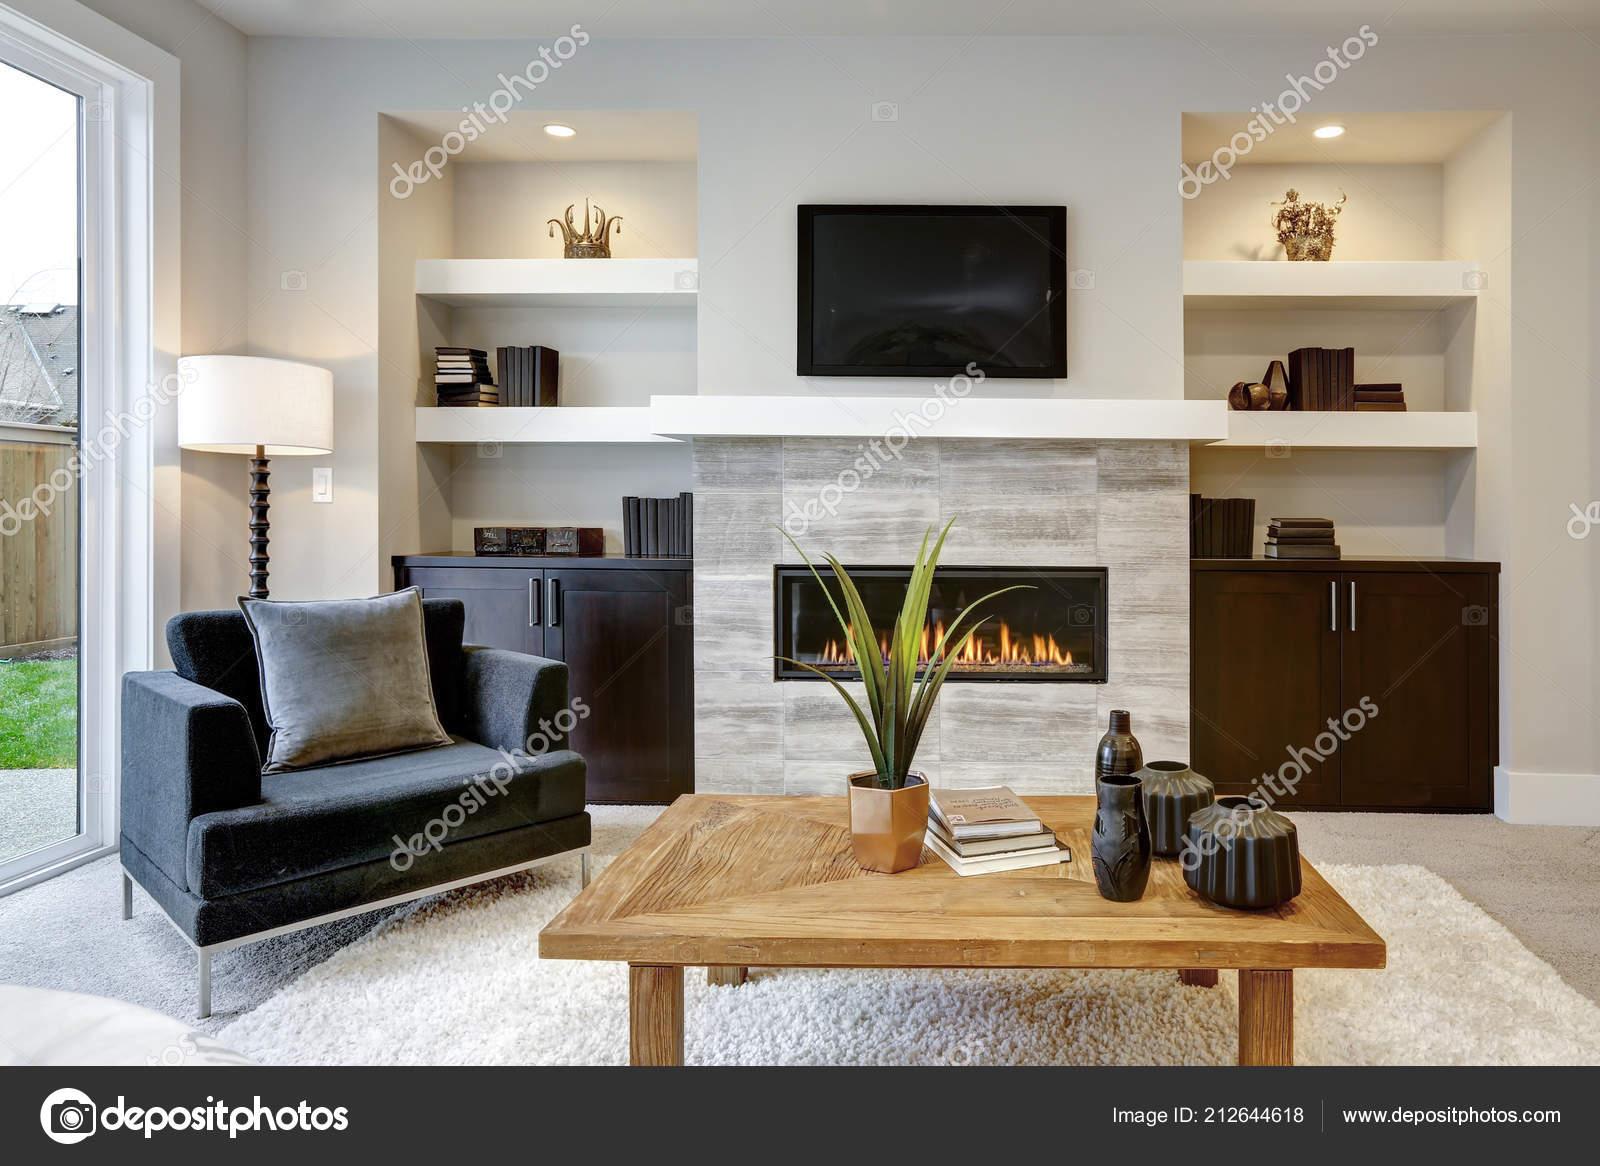 Stenen Muur Interieur : Mooie moderne woonkamer interieur met stenen muur open haard luxe